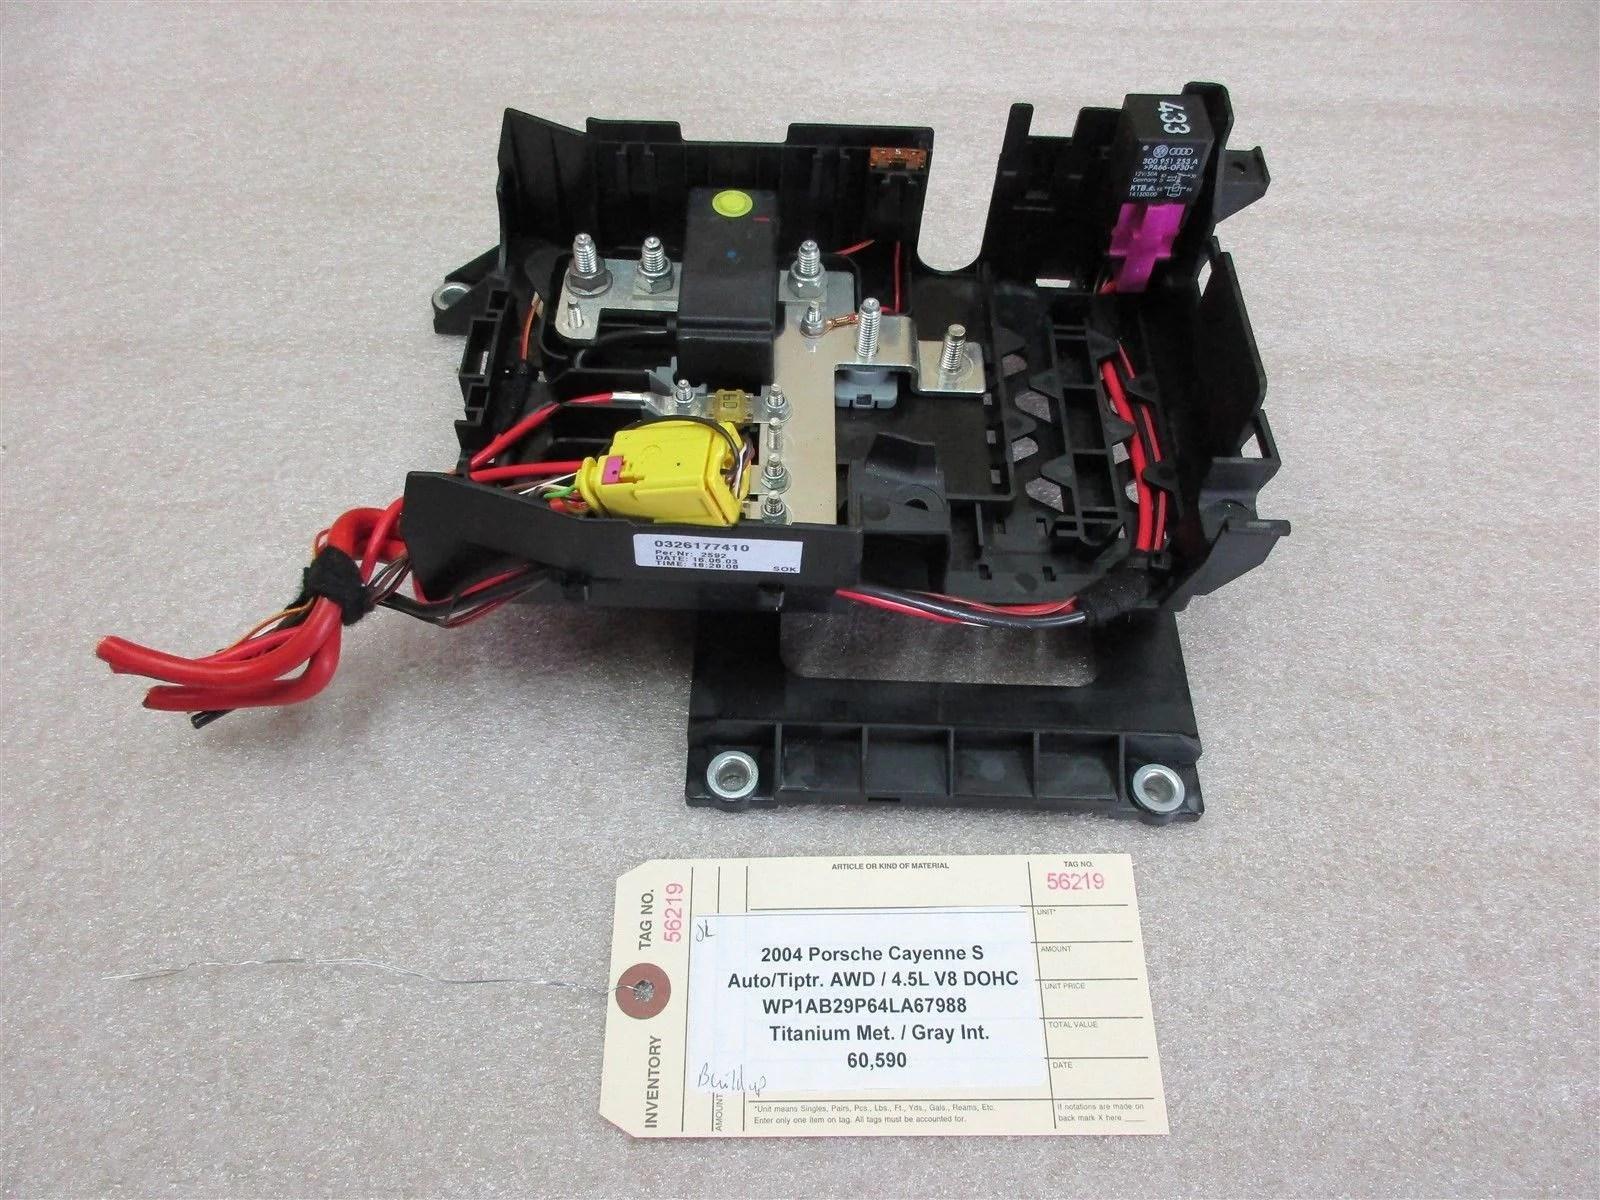 04 cayenne s awd porsche 955 seat fuse box relay 7l0937548 2012 jaguar xj fuse box 2004 porsche cayenne fuse box [ 1600 x 1200 Pixel ]